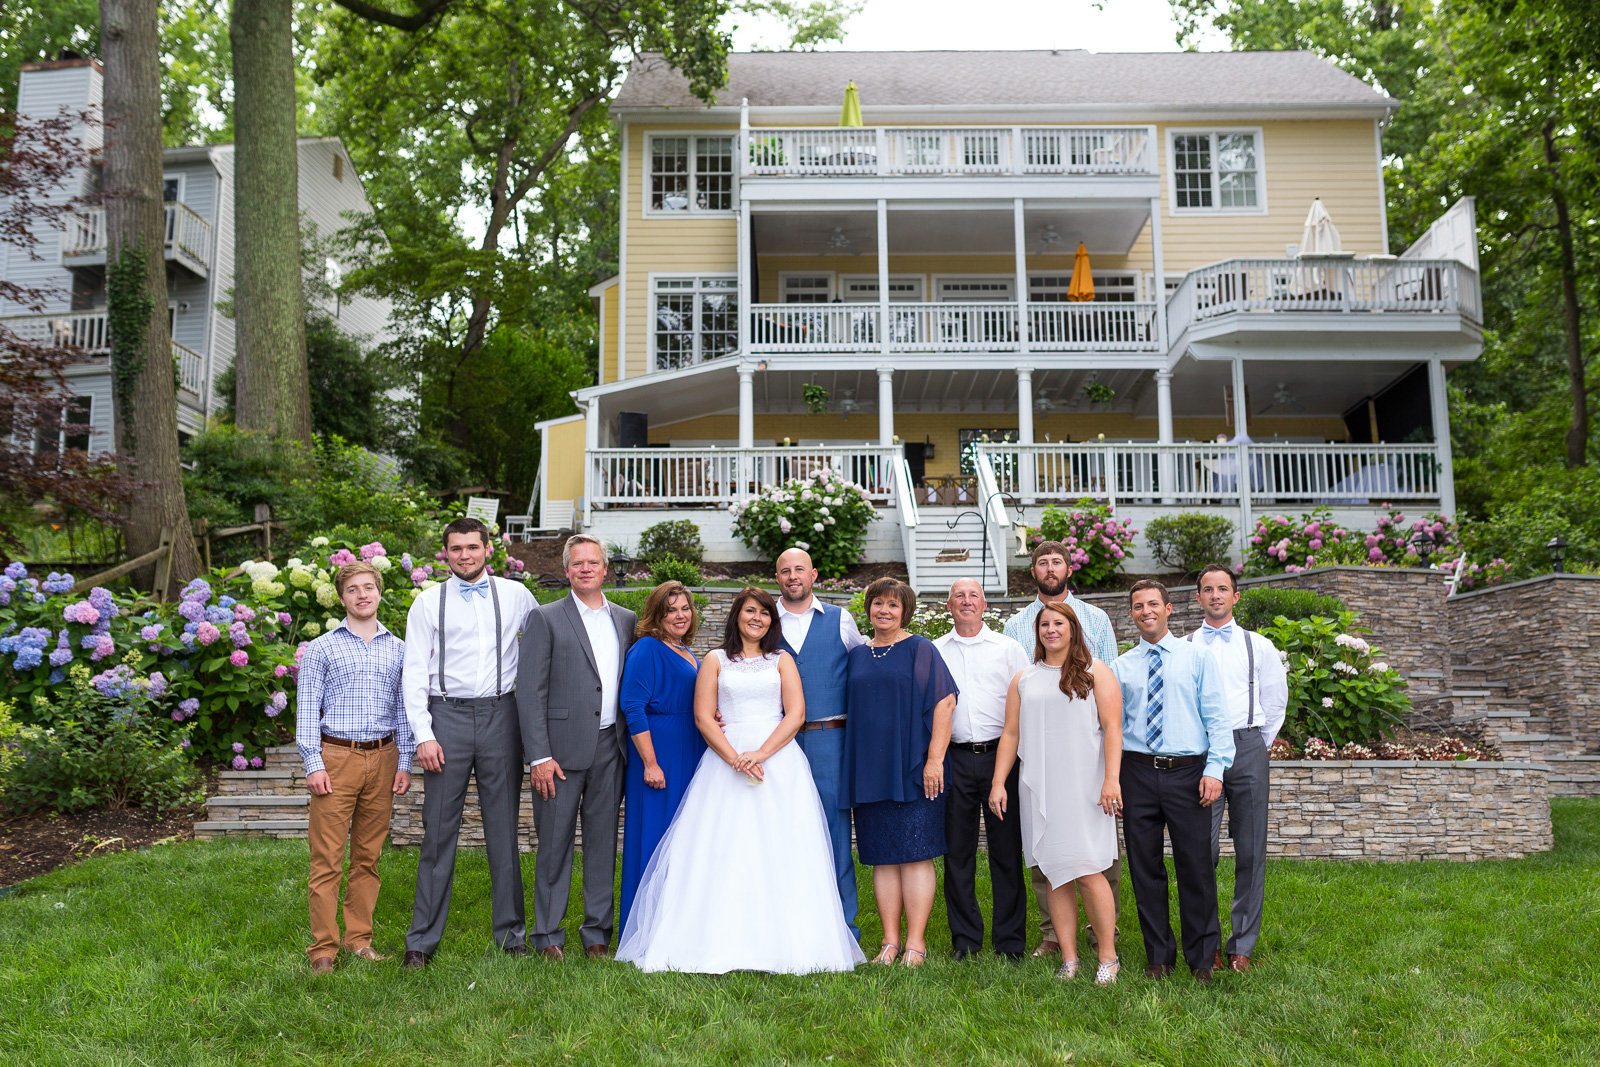 Vacation House Wedding